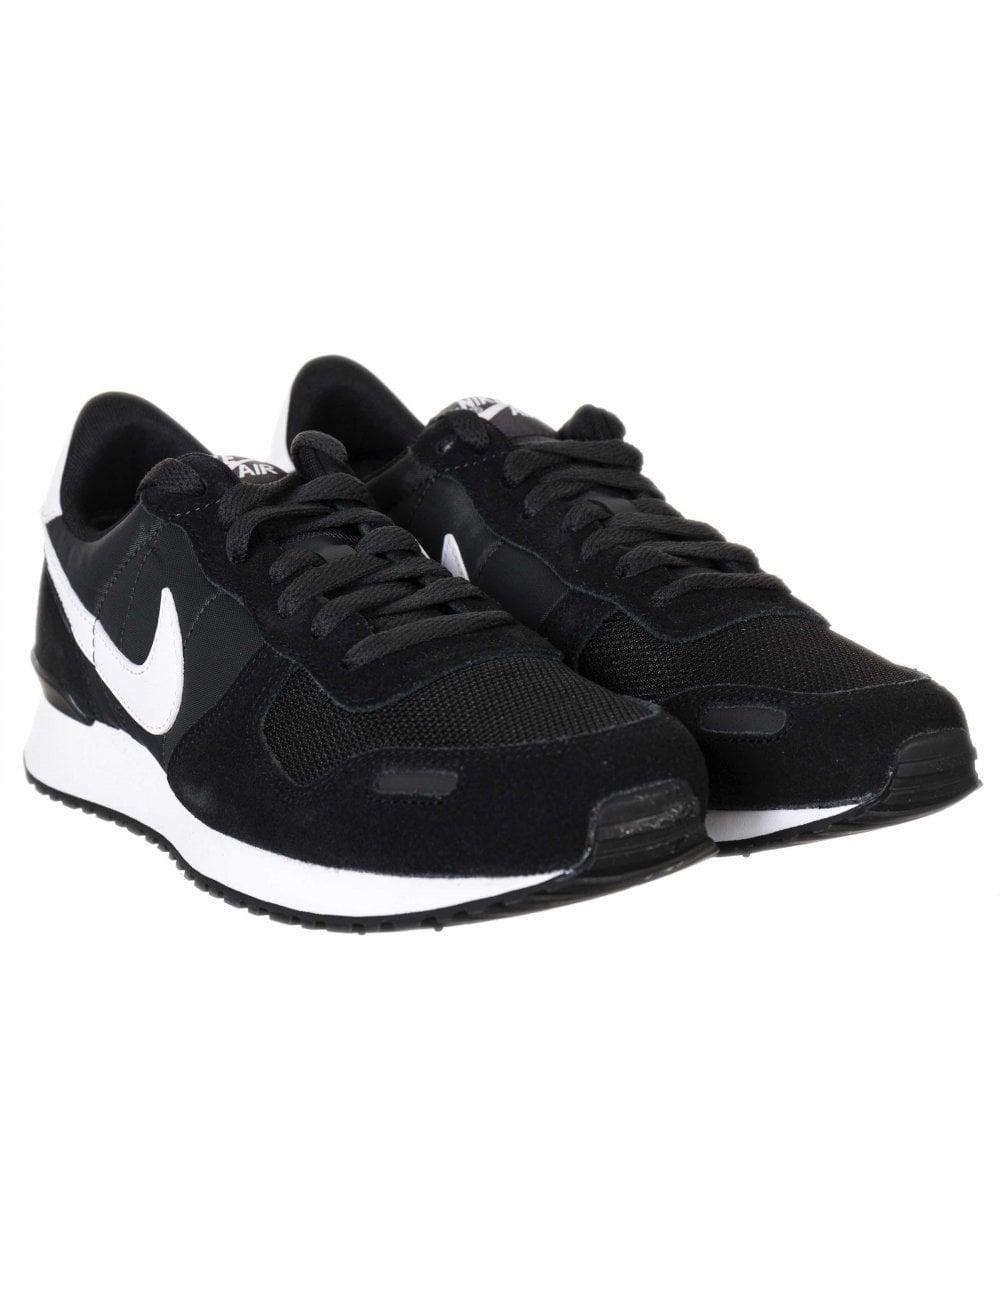 Nike Air Vortex Trainers - Black/White